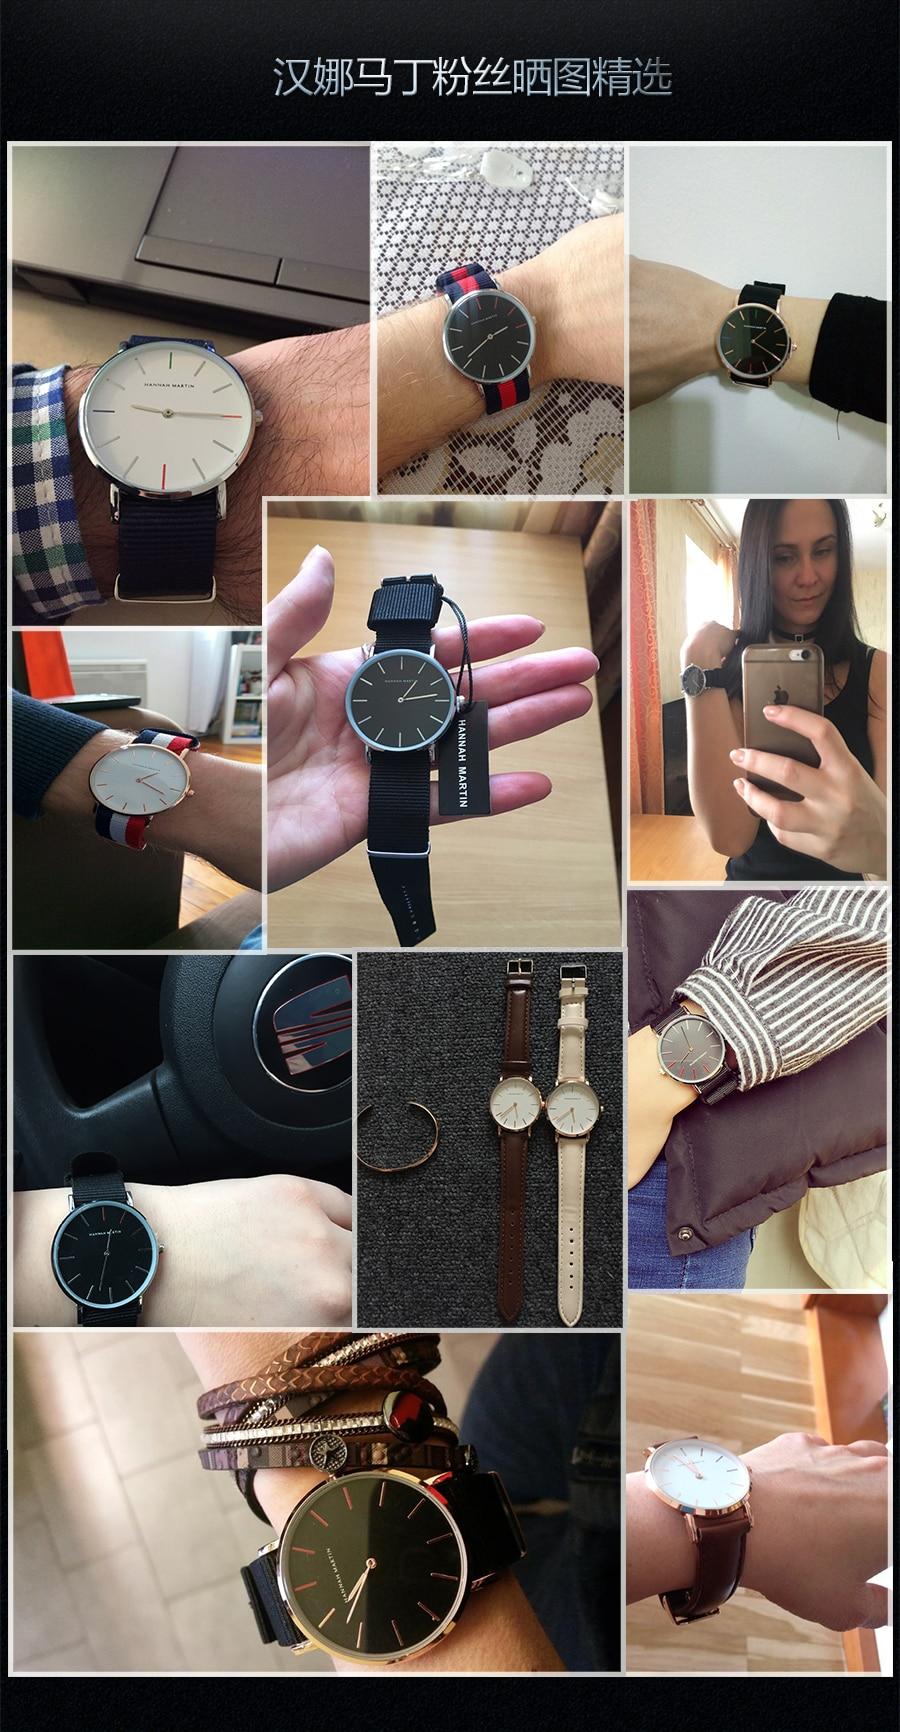 HTB1talbacfrK1RkSmLyq6xGApXao Men Wrist Watch Leather Casual Waterproof Calendar